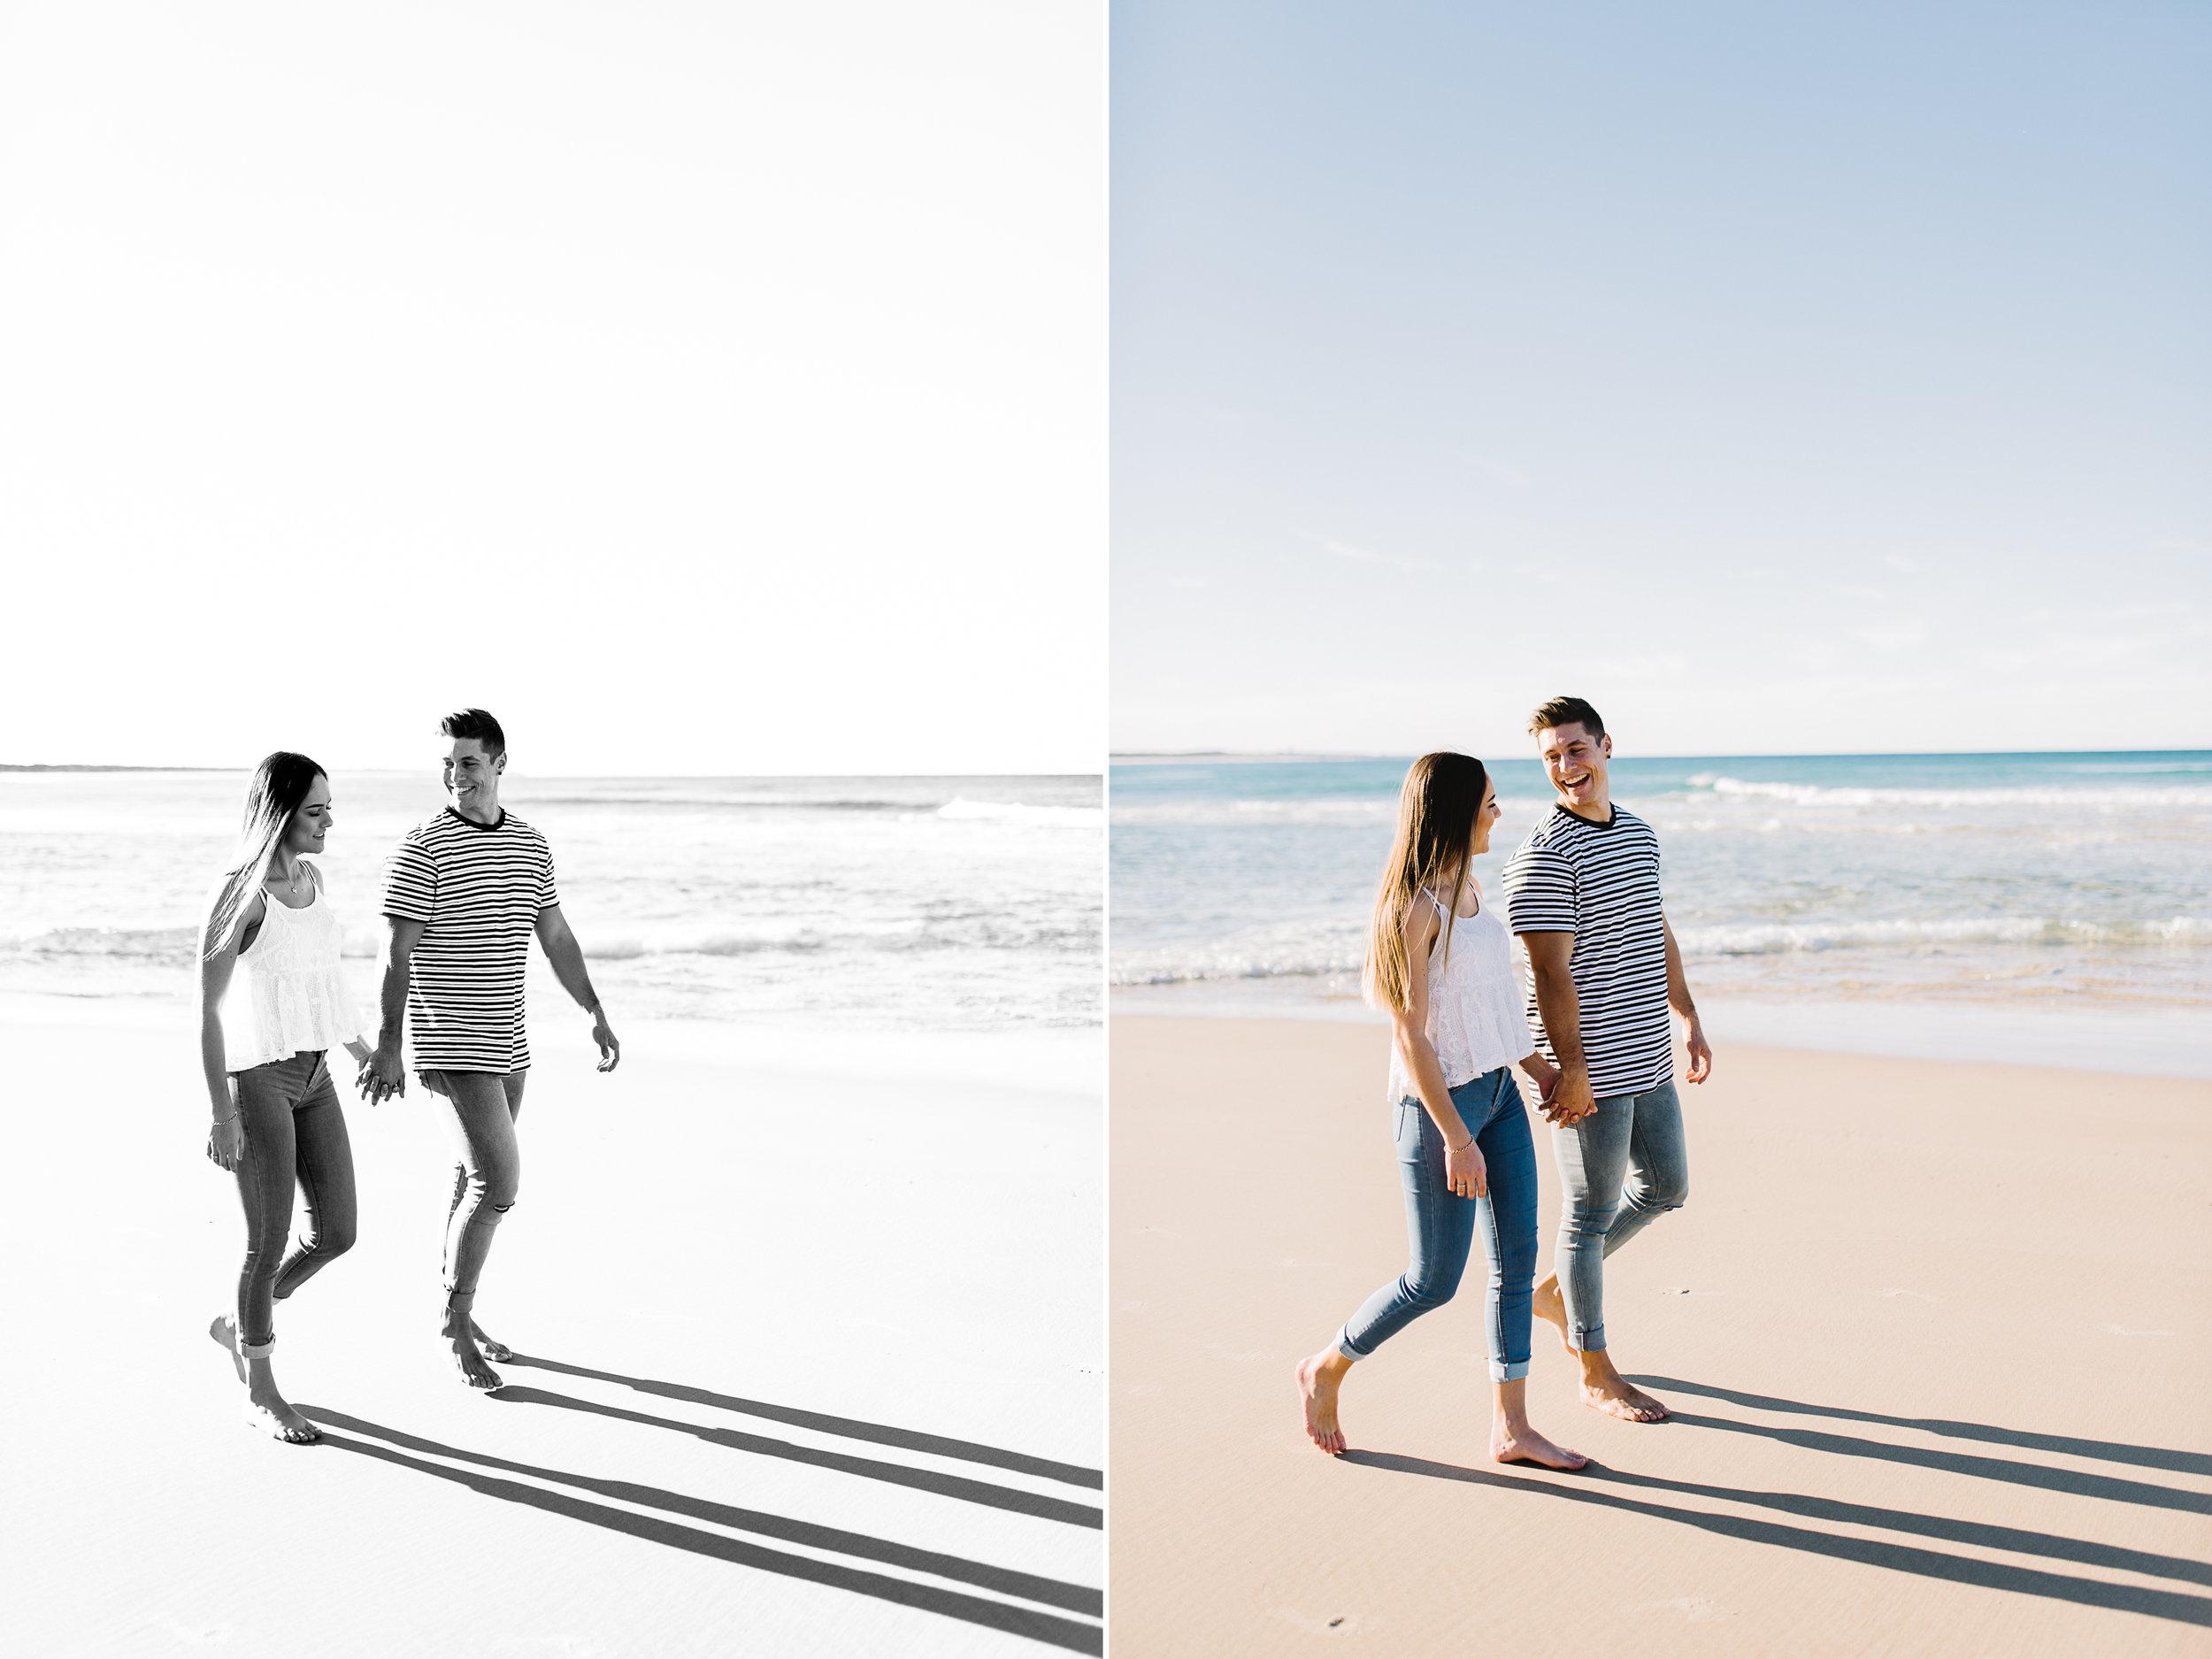 beach-engagement-shoot-13.jpg